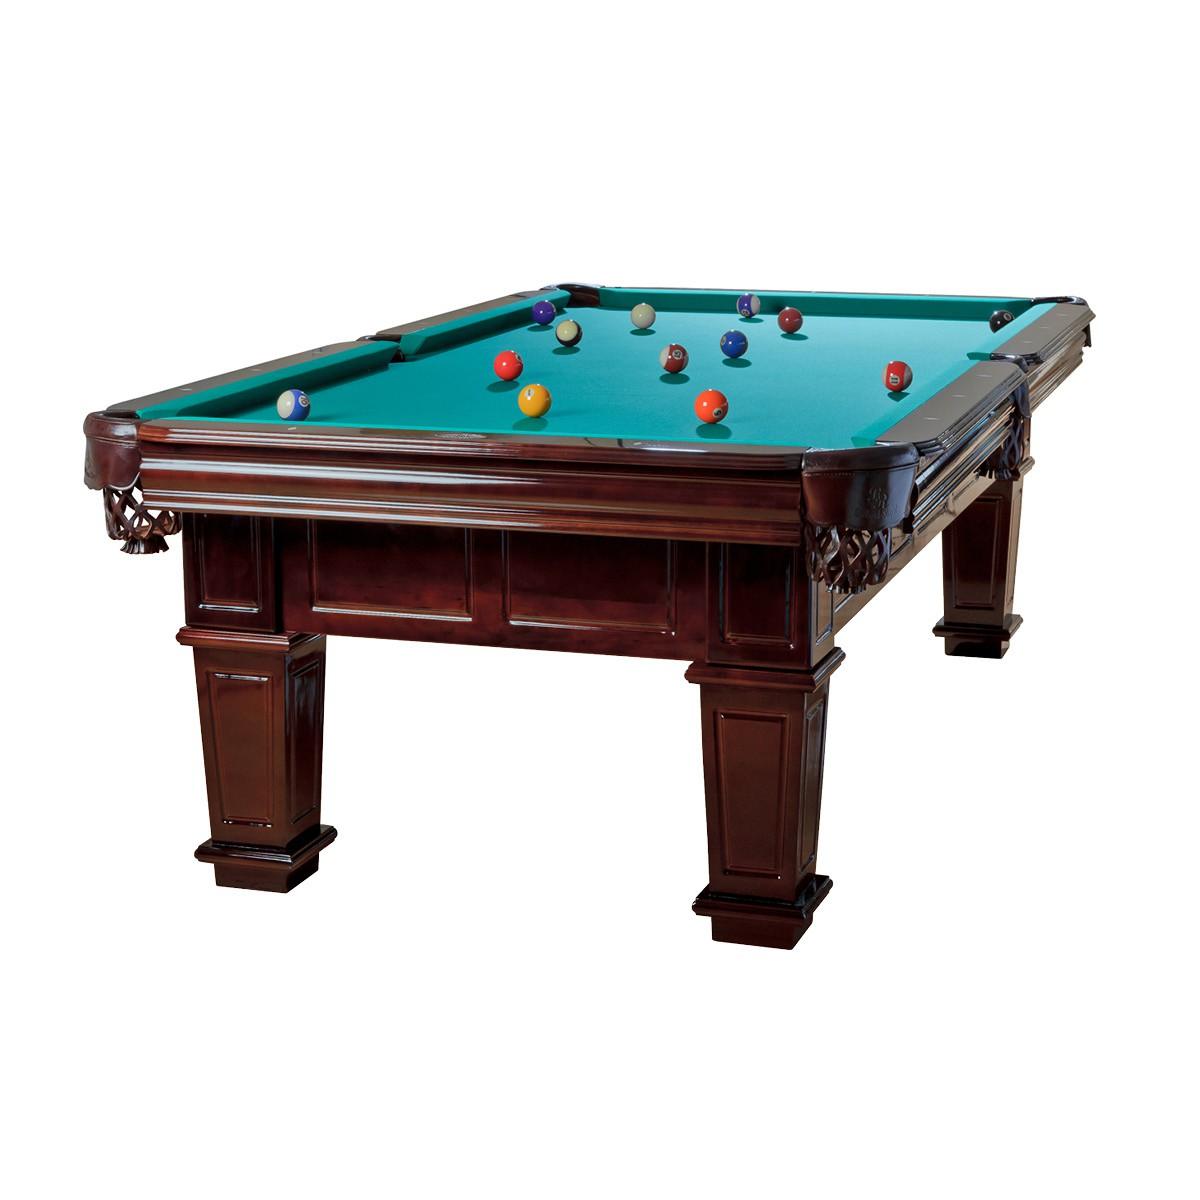 8 ft profi pool billardtisch billard billiard modell for 8 ft garden pool